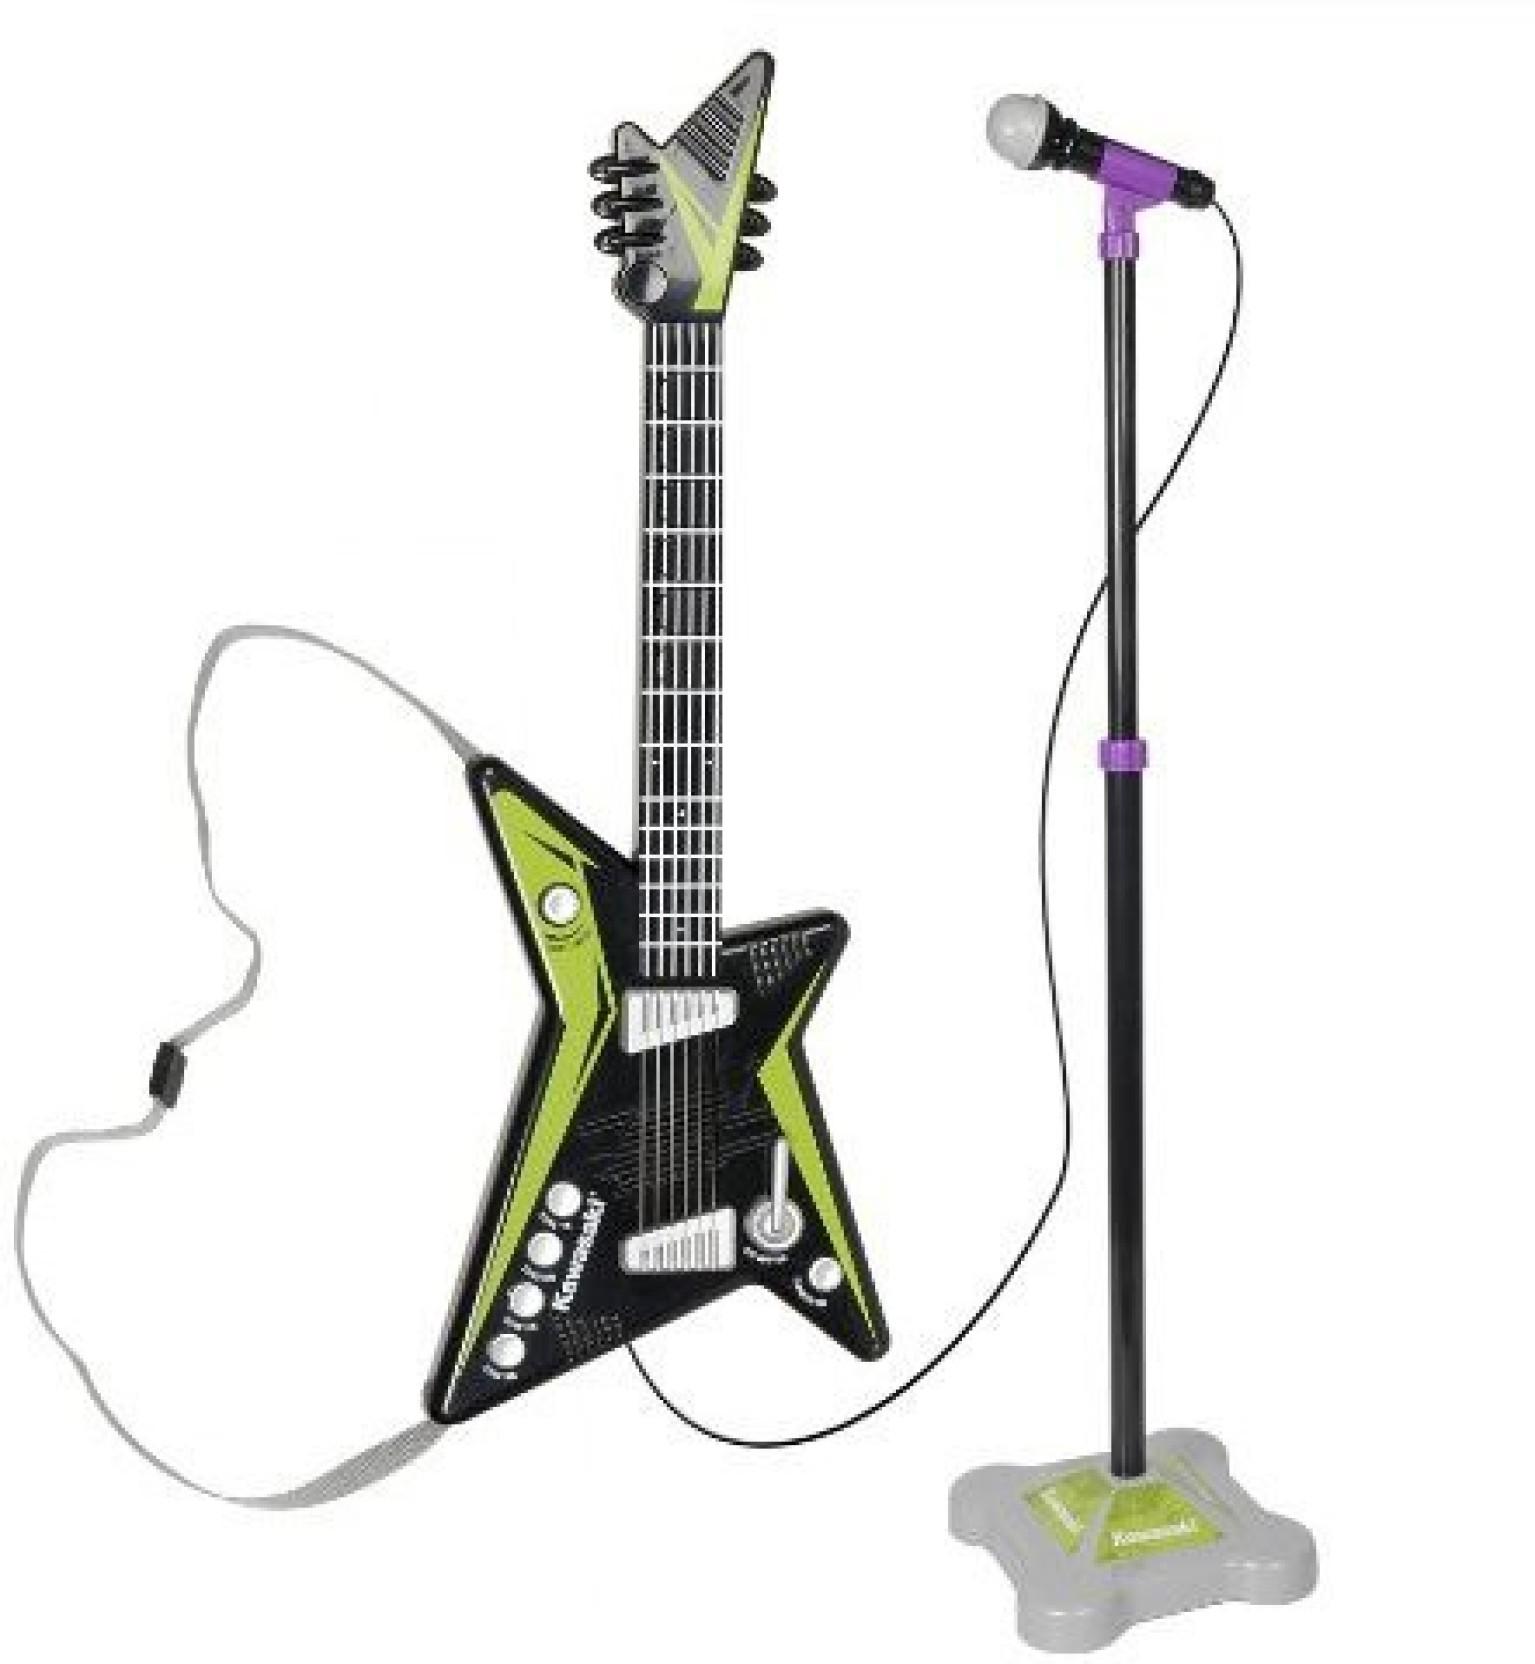 Kawasaki Guitar Toy For Boys Wwwtopsimagescom